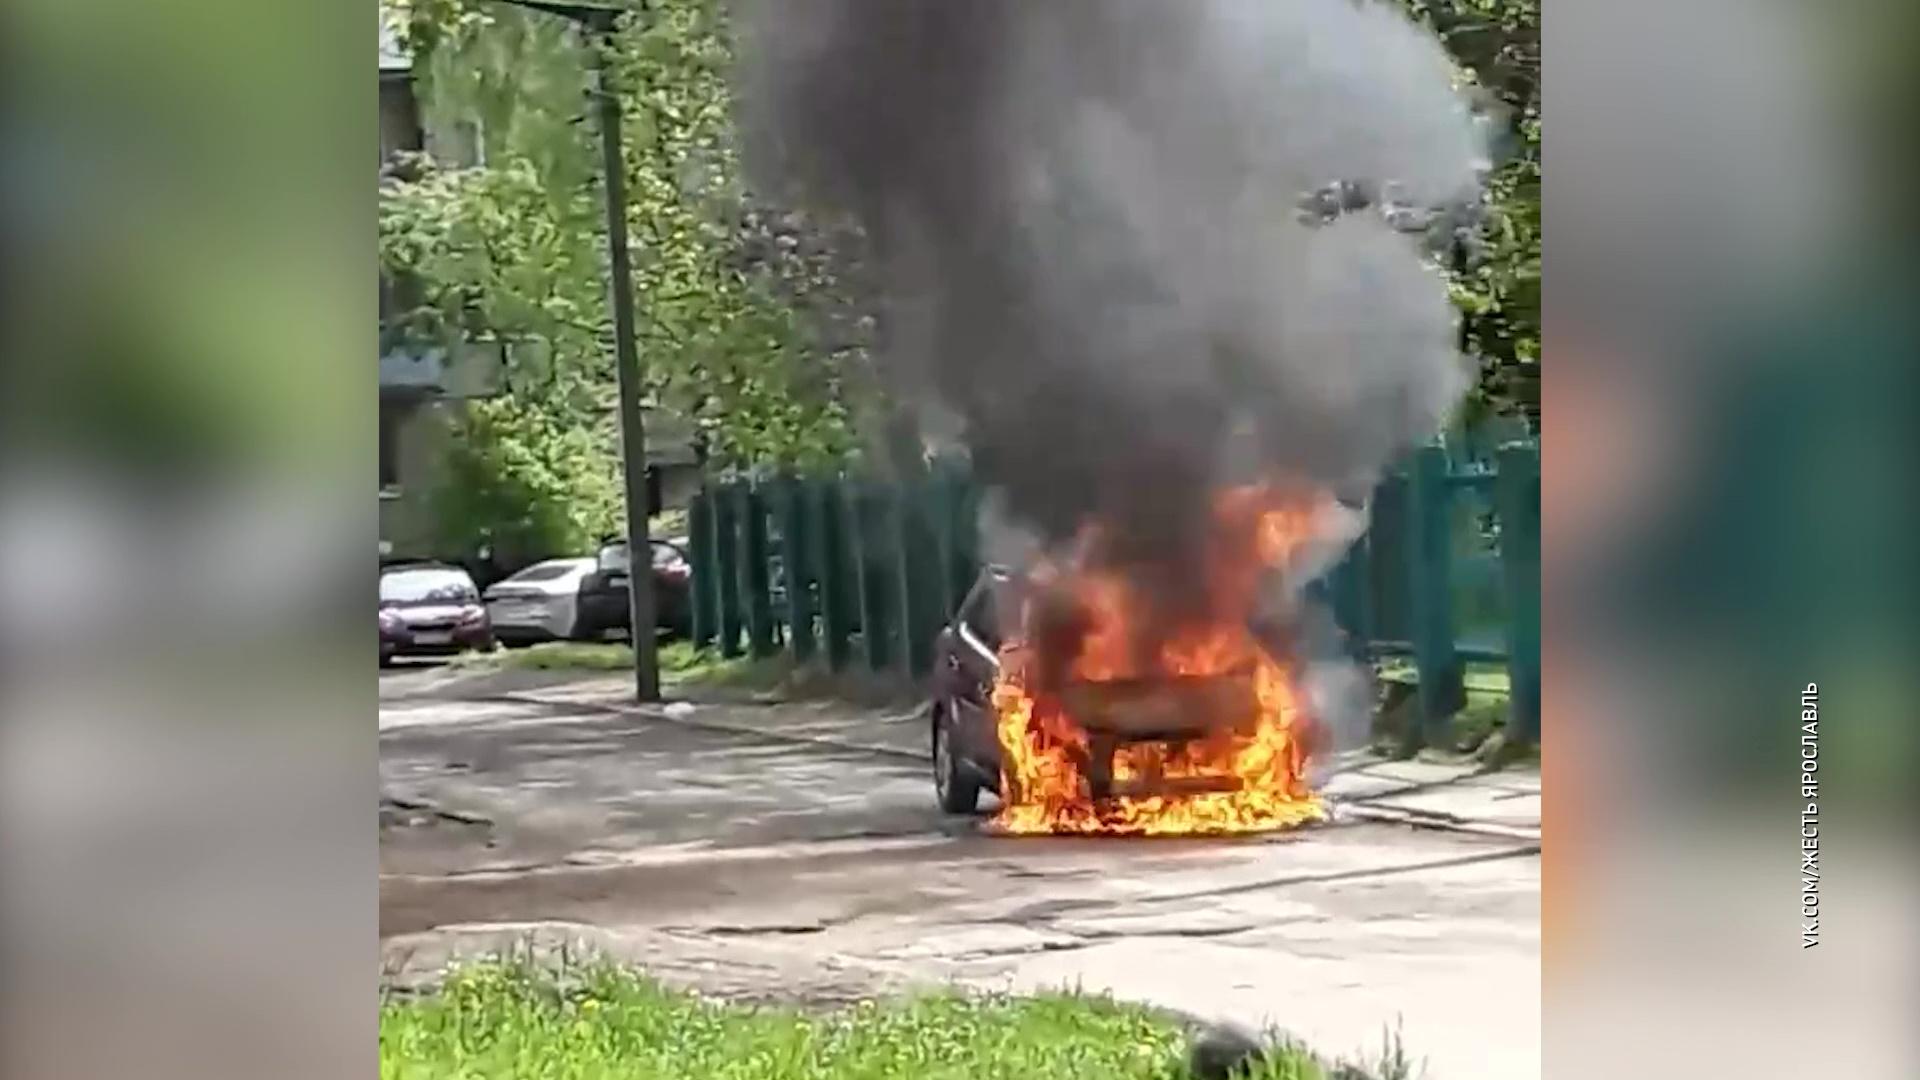 Напротив садика на Ньютона сгорела иномарка